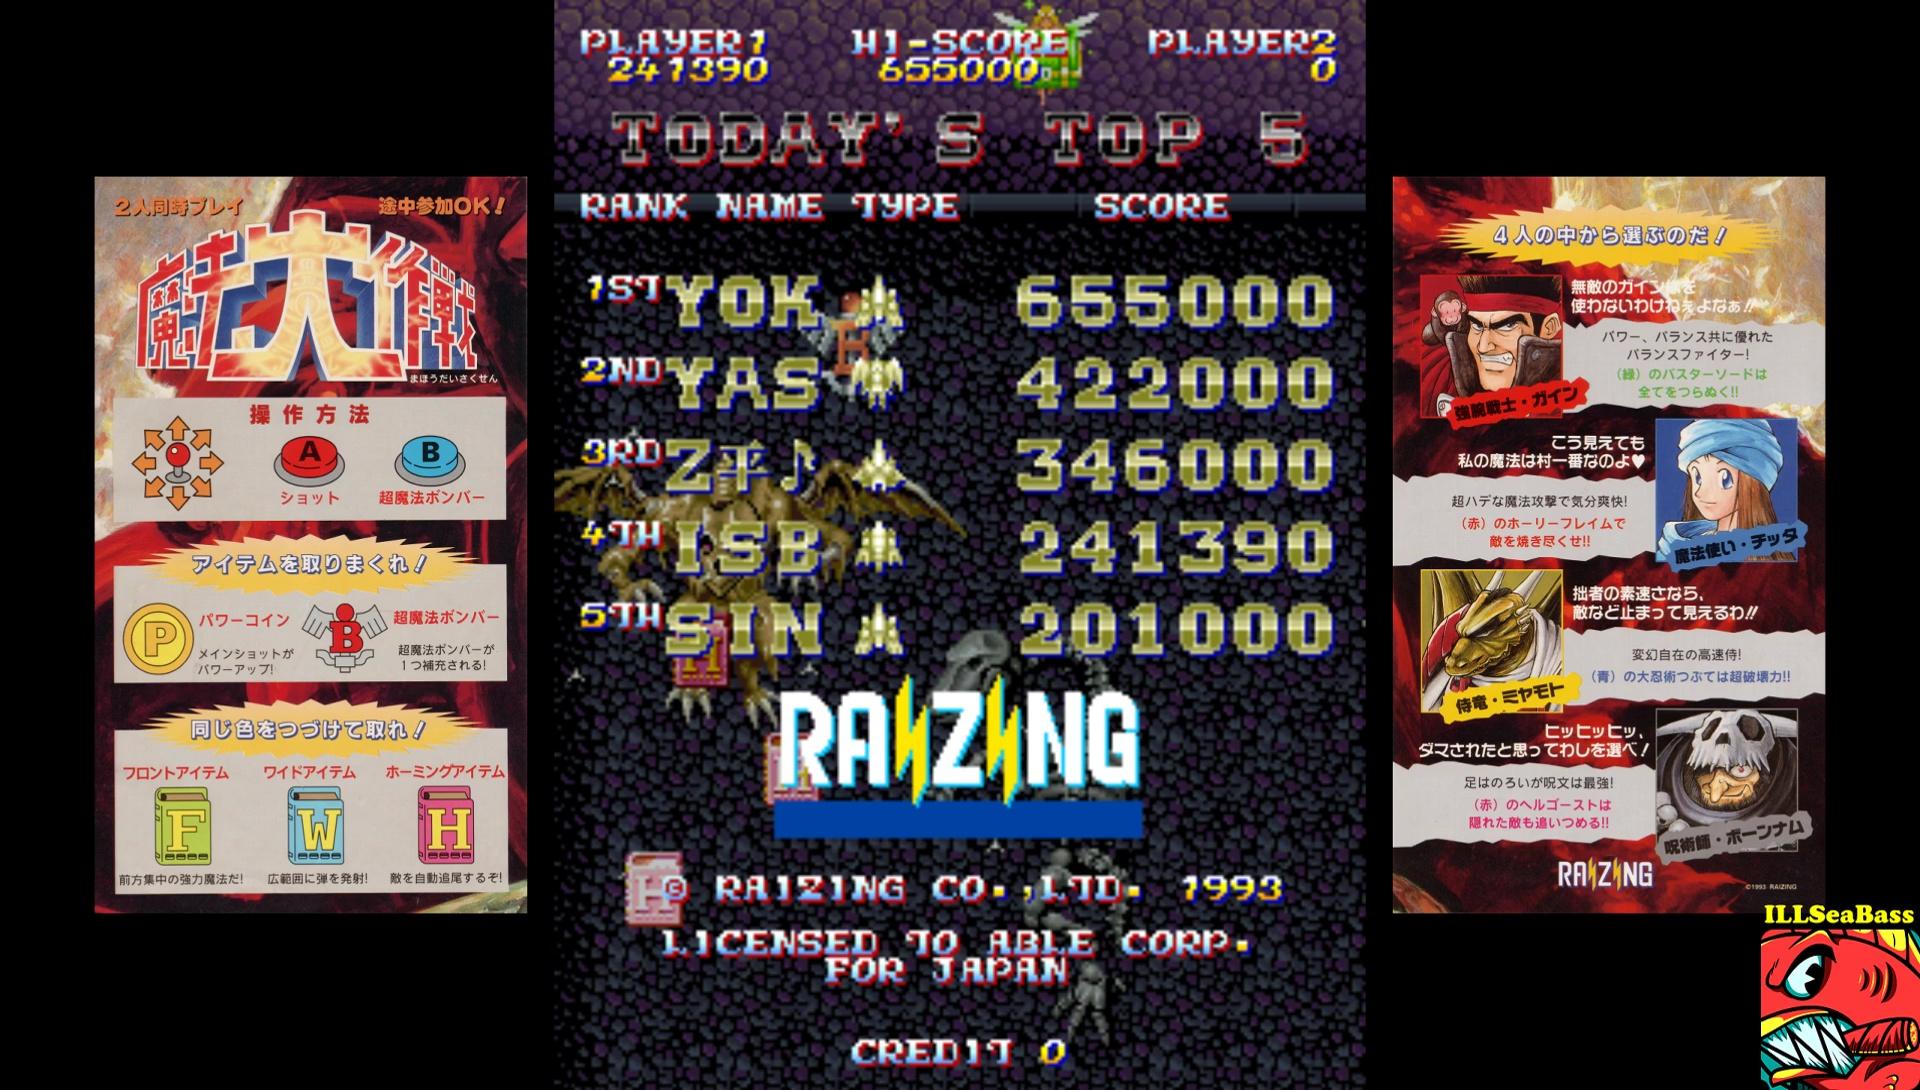 ILLSeaBass: Mahou Daisakusen [mahoudai] (Arcade Emulated / M.A.M.E.) 241,390 points on 2017-08-19 14:46:44